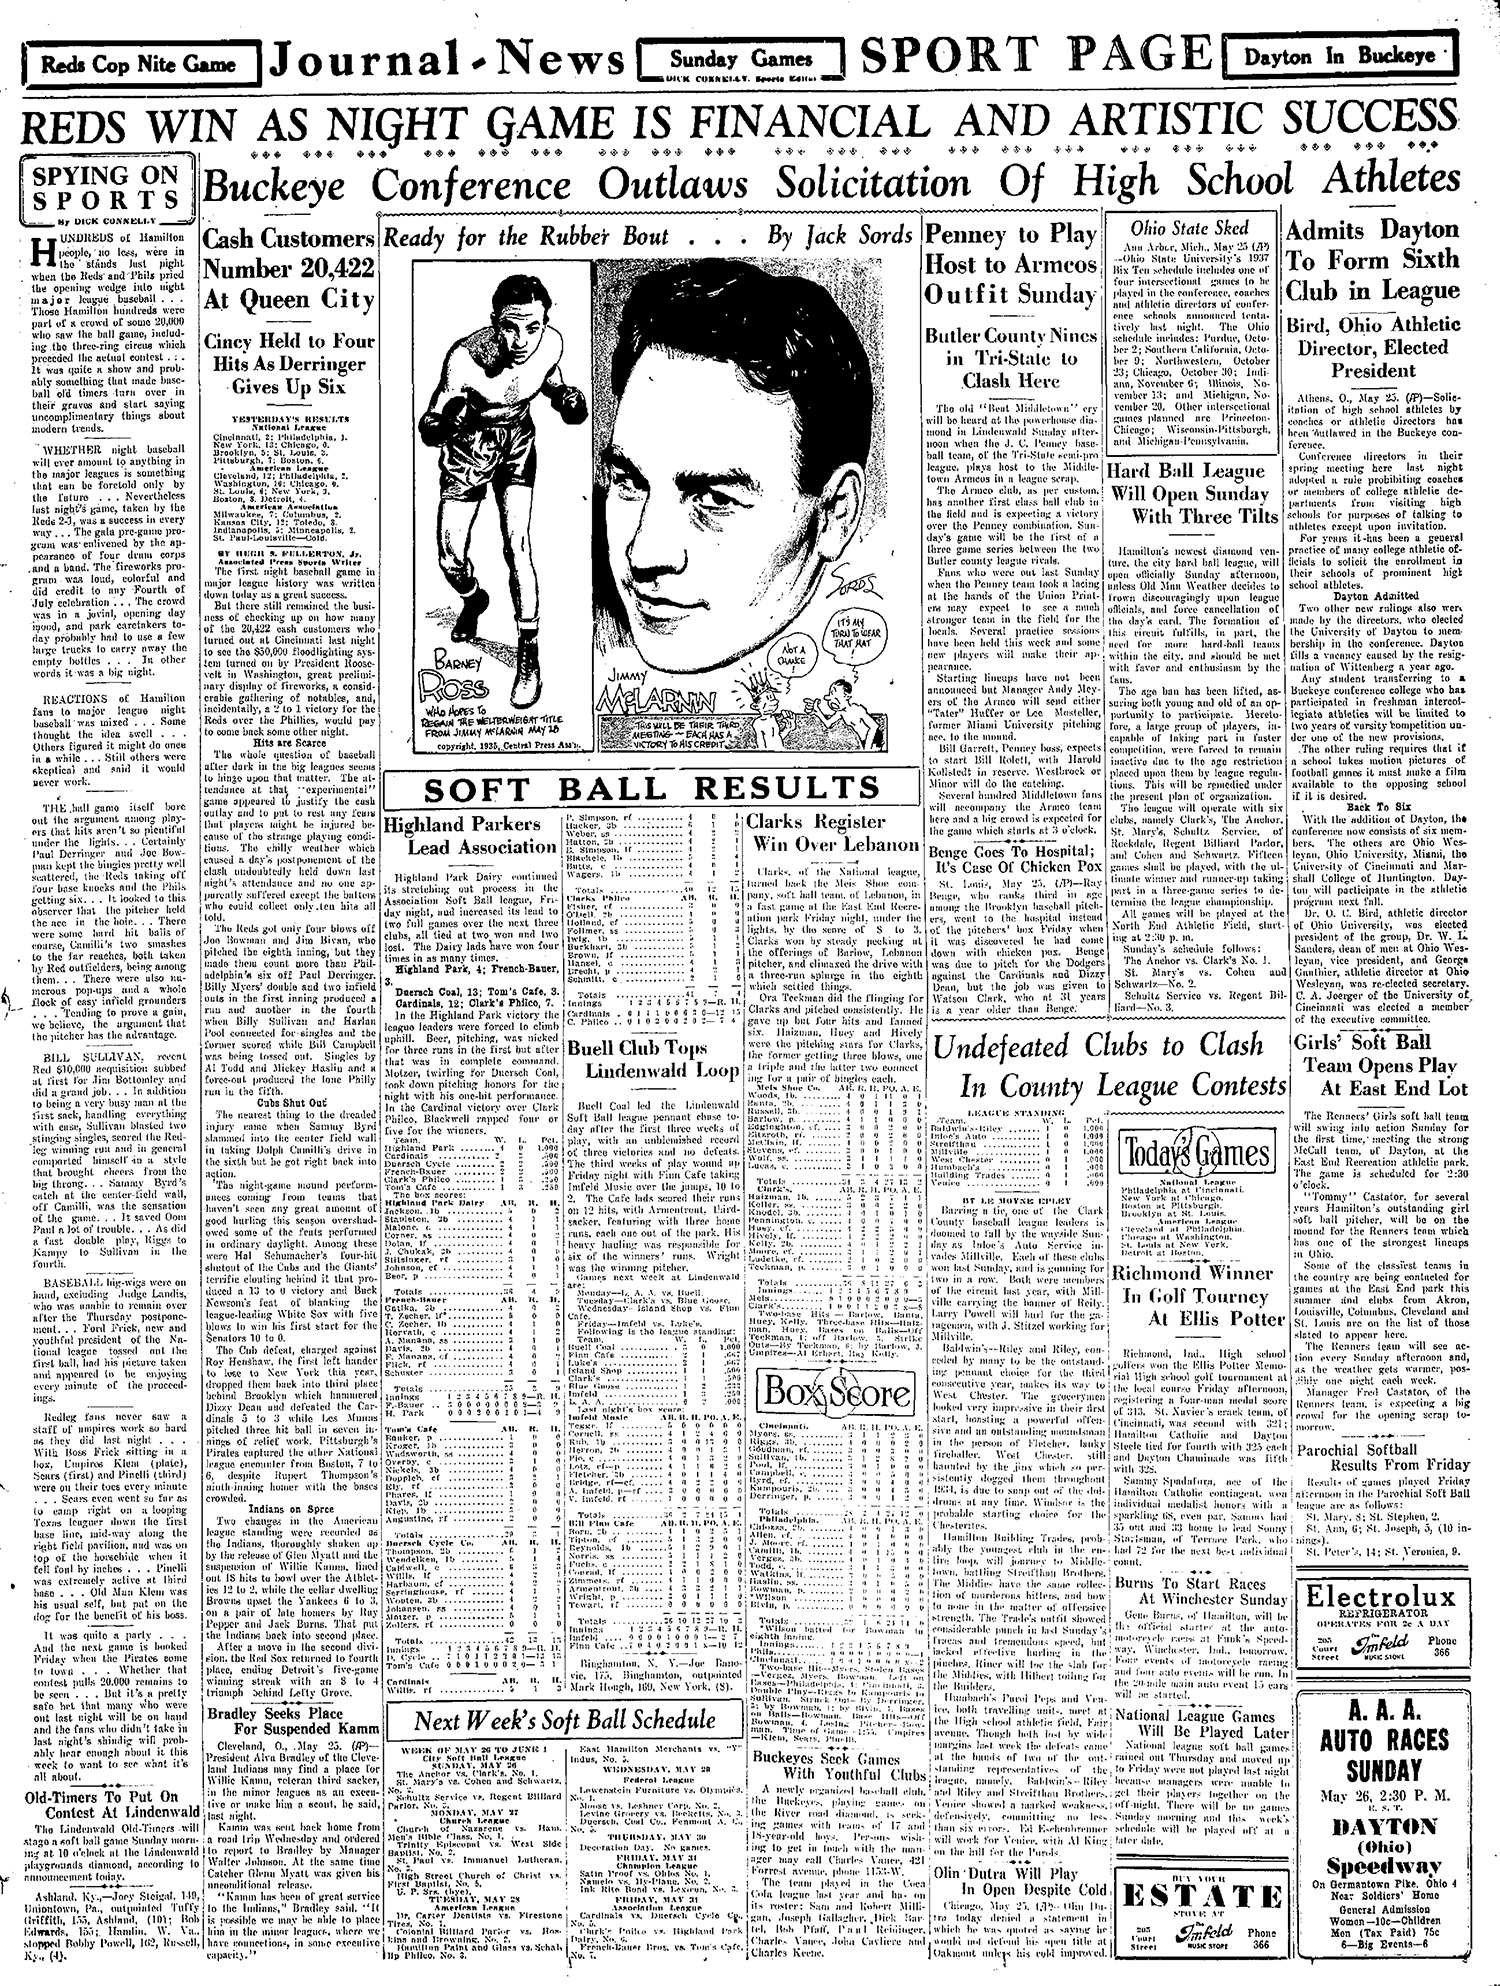 first night game cincy 1935.jpg